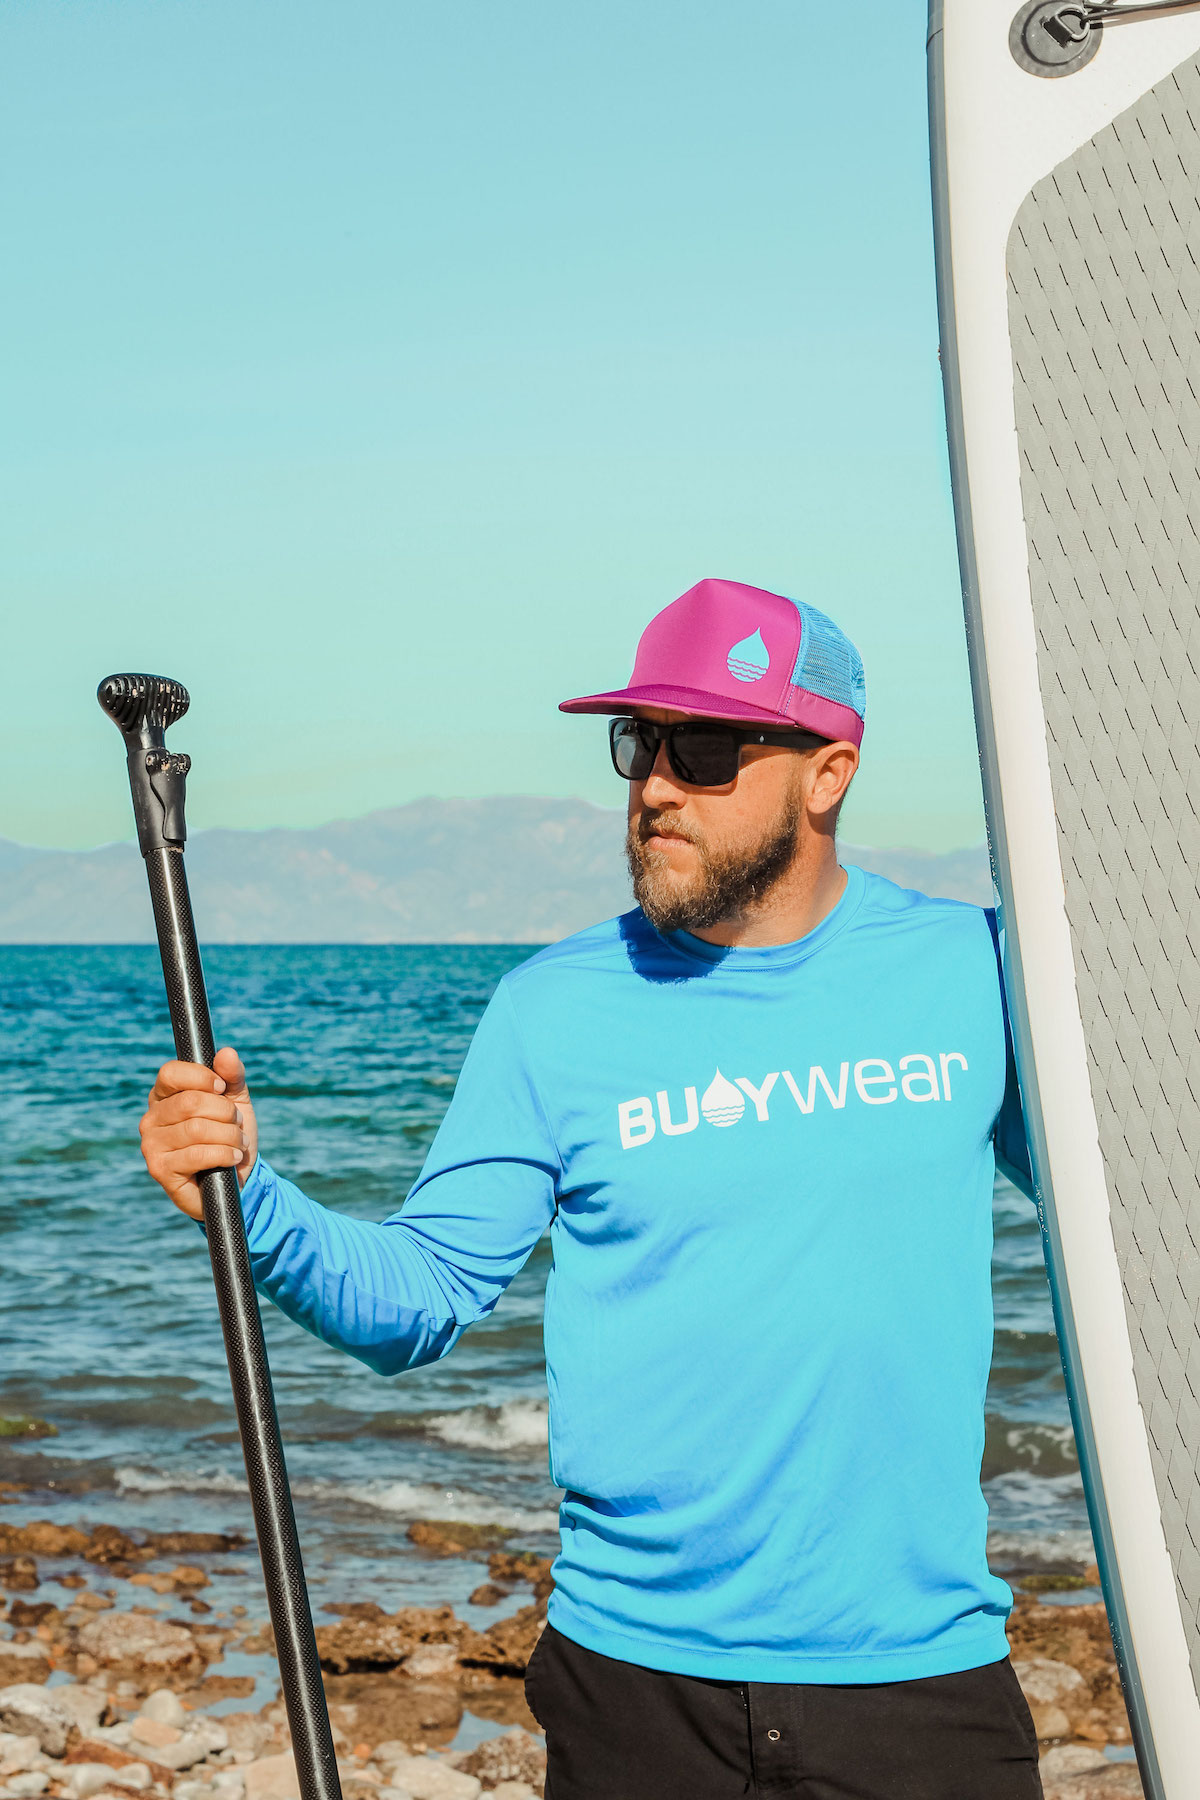 buoy wear apparel 2